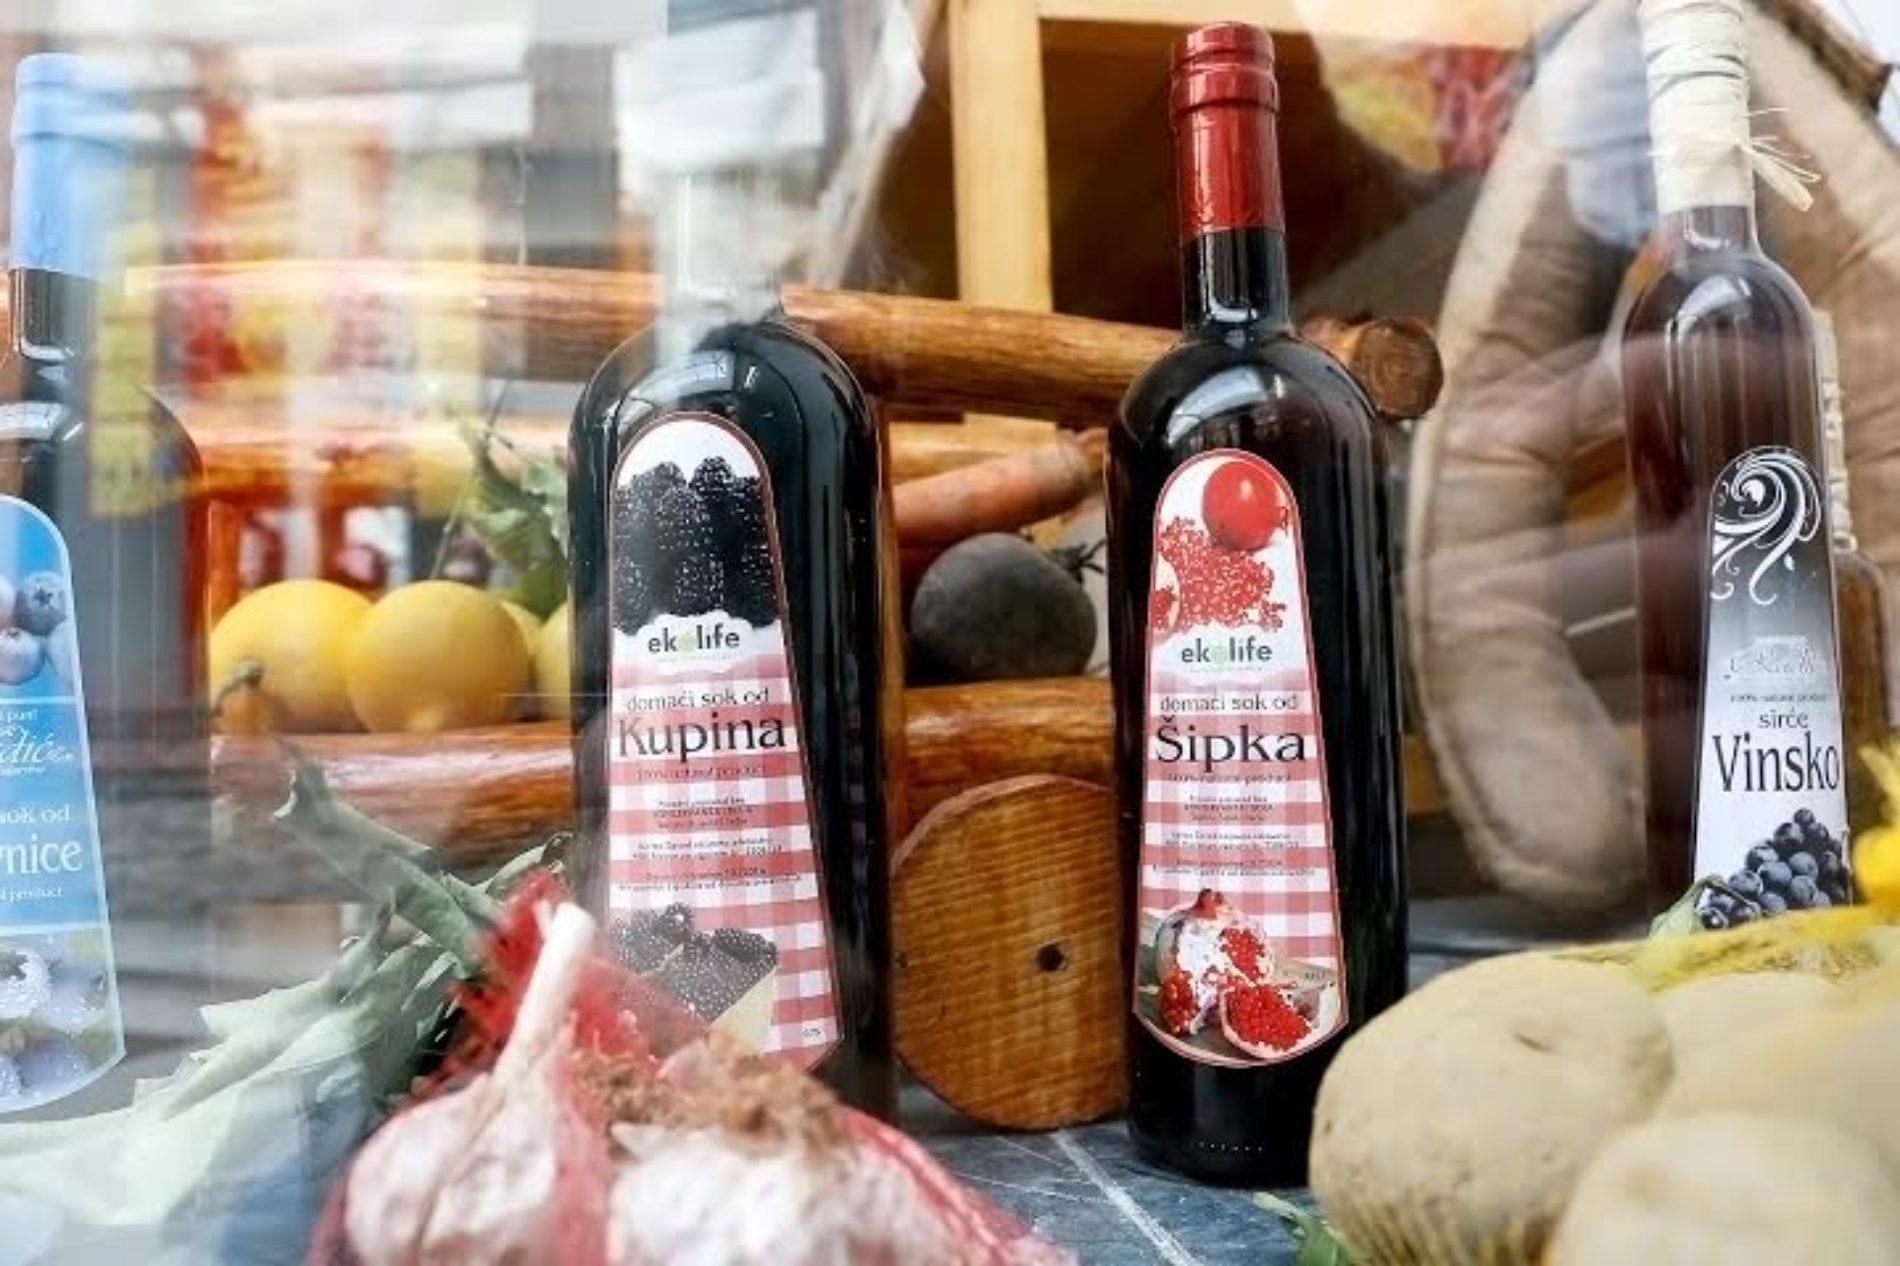 Bosanska tržnica: Domaća, organska, a nije skupa